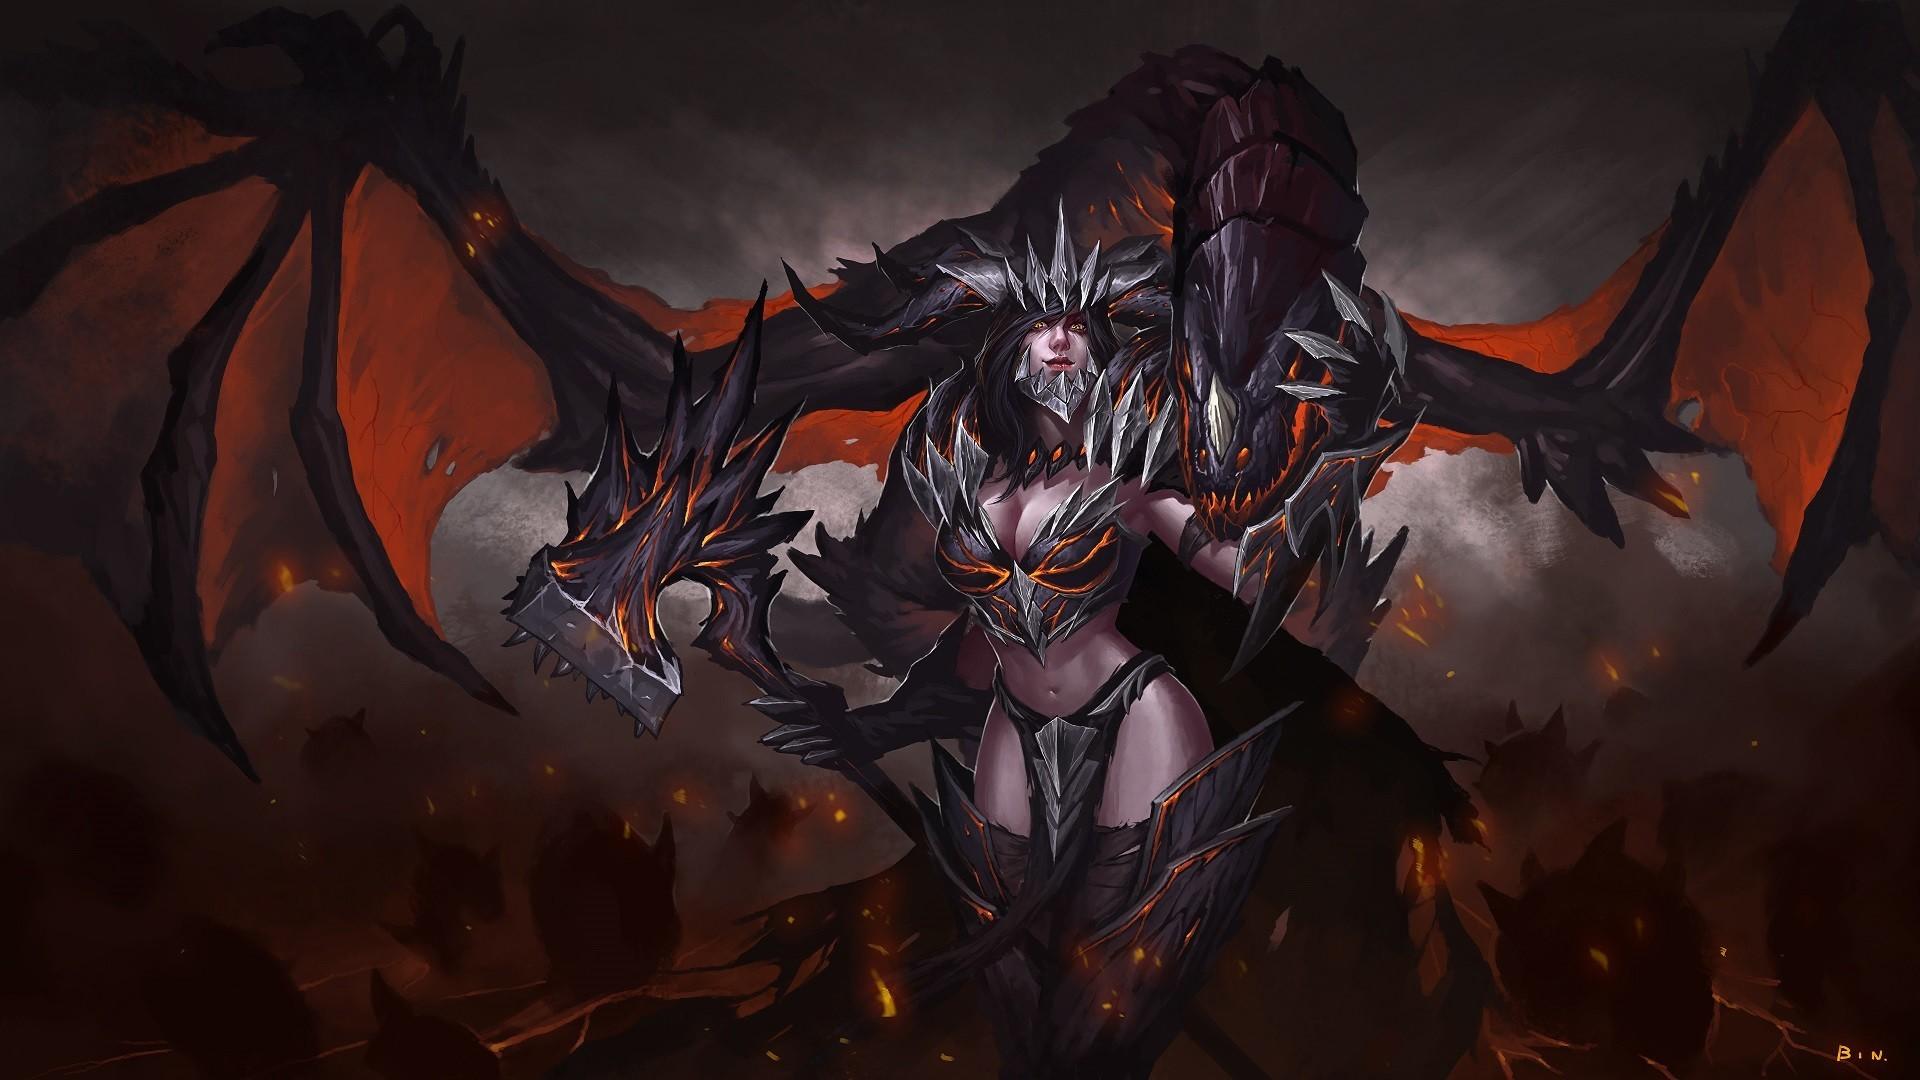 General 1920x1080 dark fantasy fantasy art fantasy girl World of Warcraft: Cataclysm Deathwing rule 63